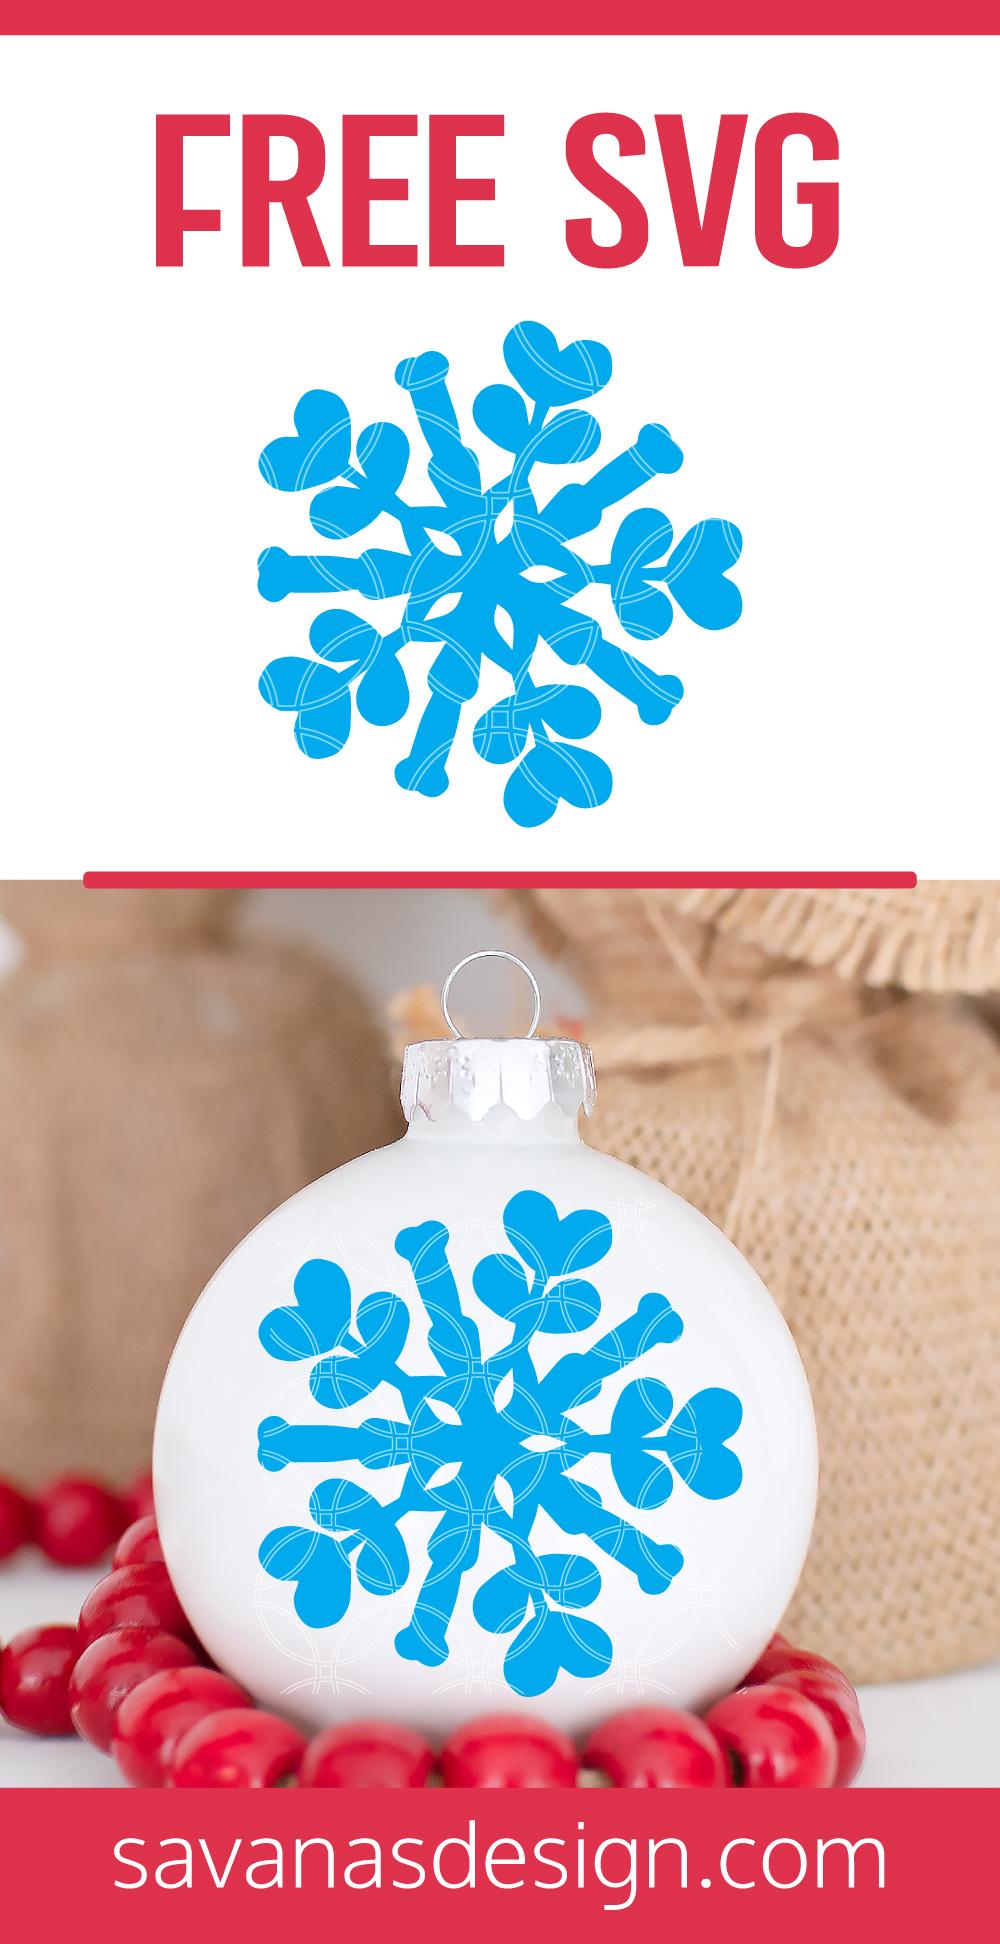 Free Snowflake SVG Pinterest